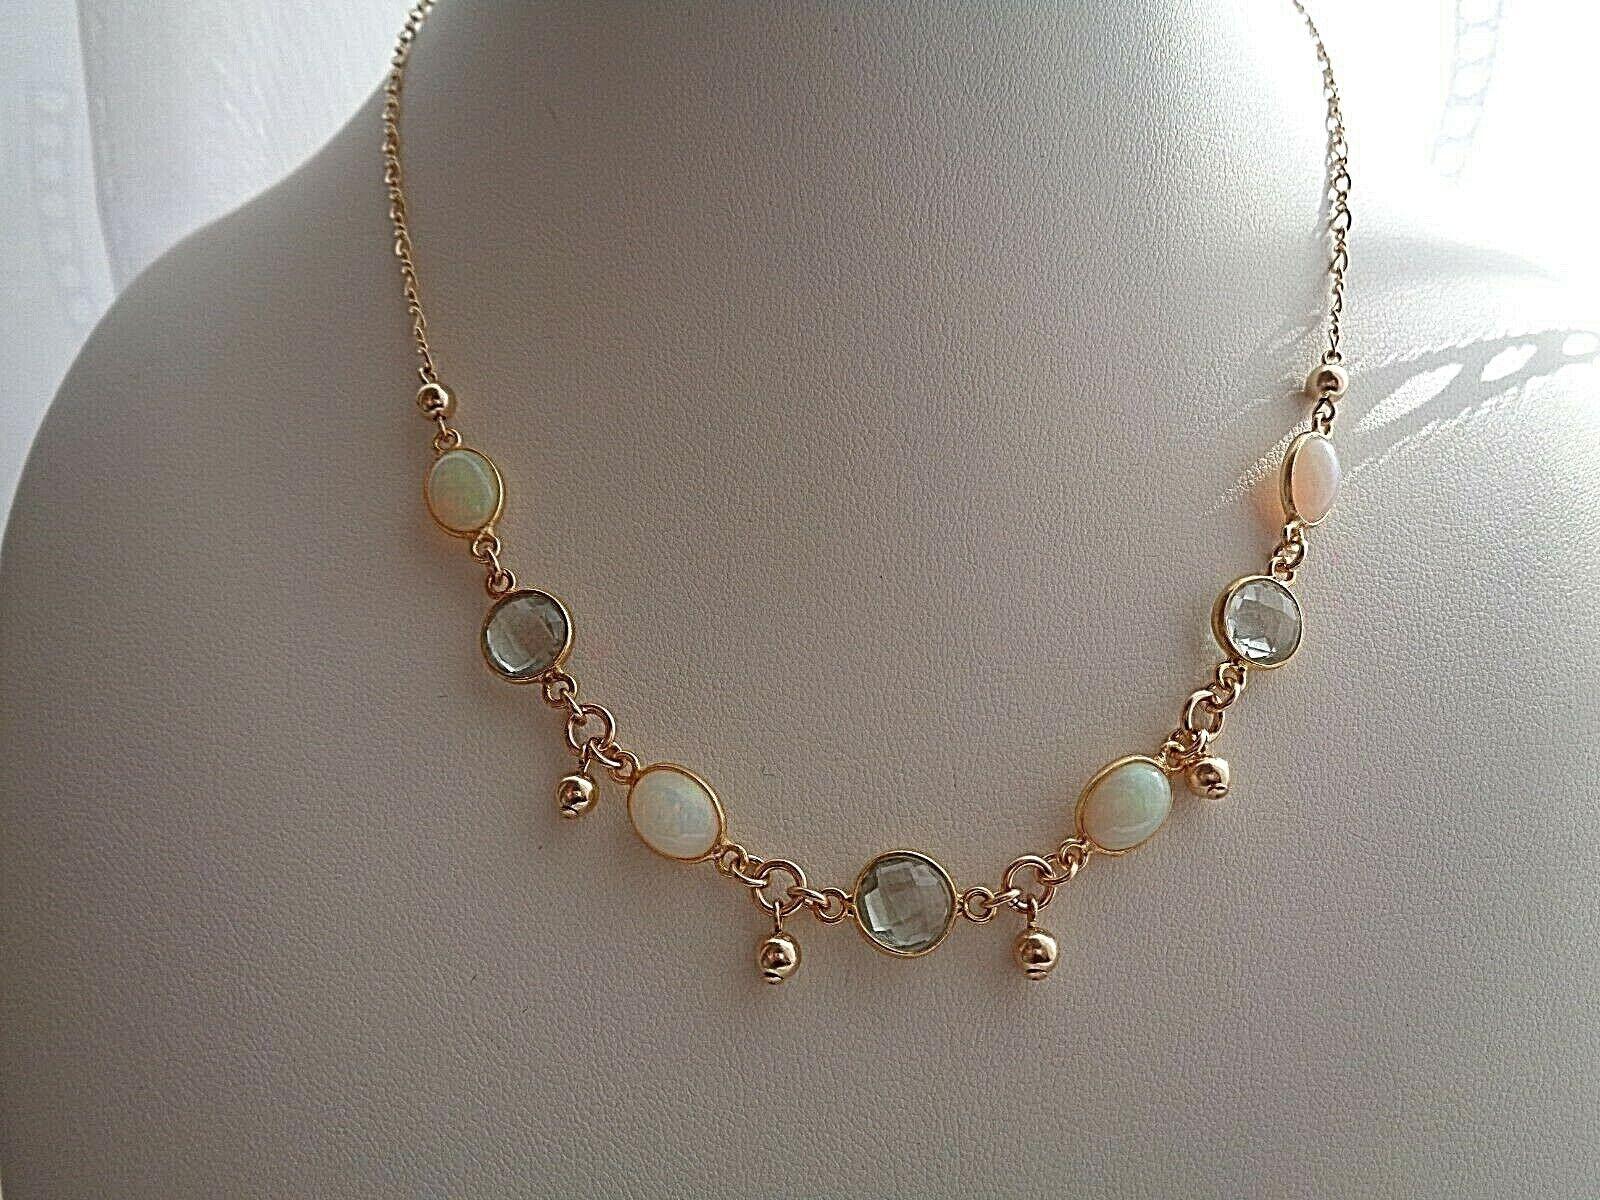 Kette mit Opal und grünem Amethyst, 585 Gold Filled, zartes,edles Design